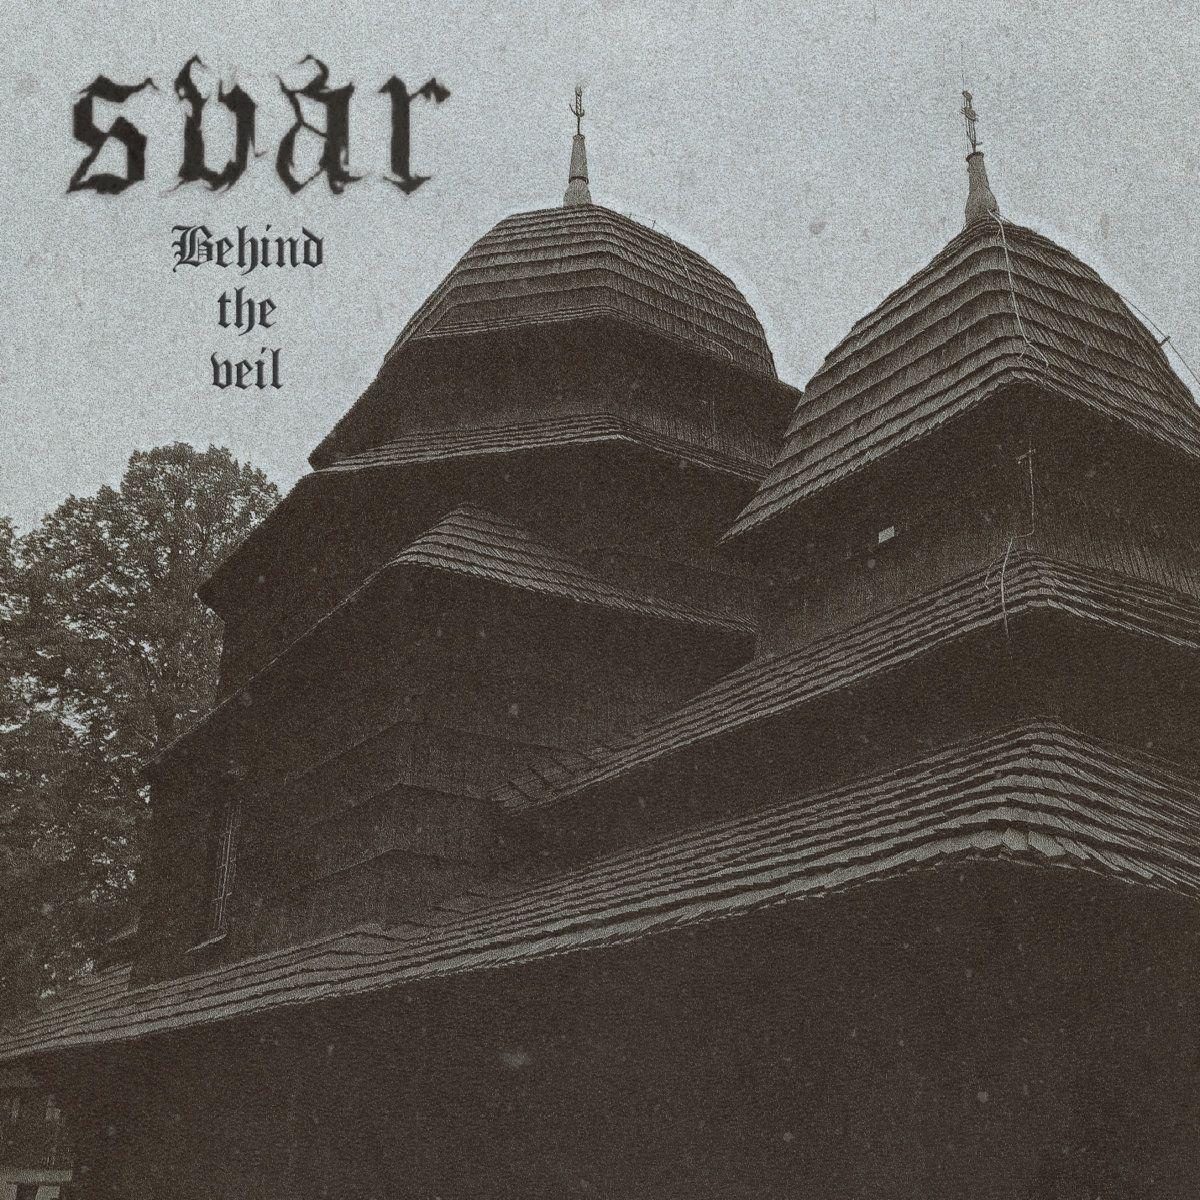 Reviews for Svar - Behind the Veil